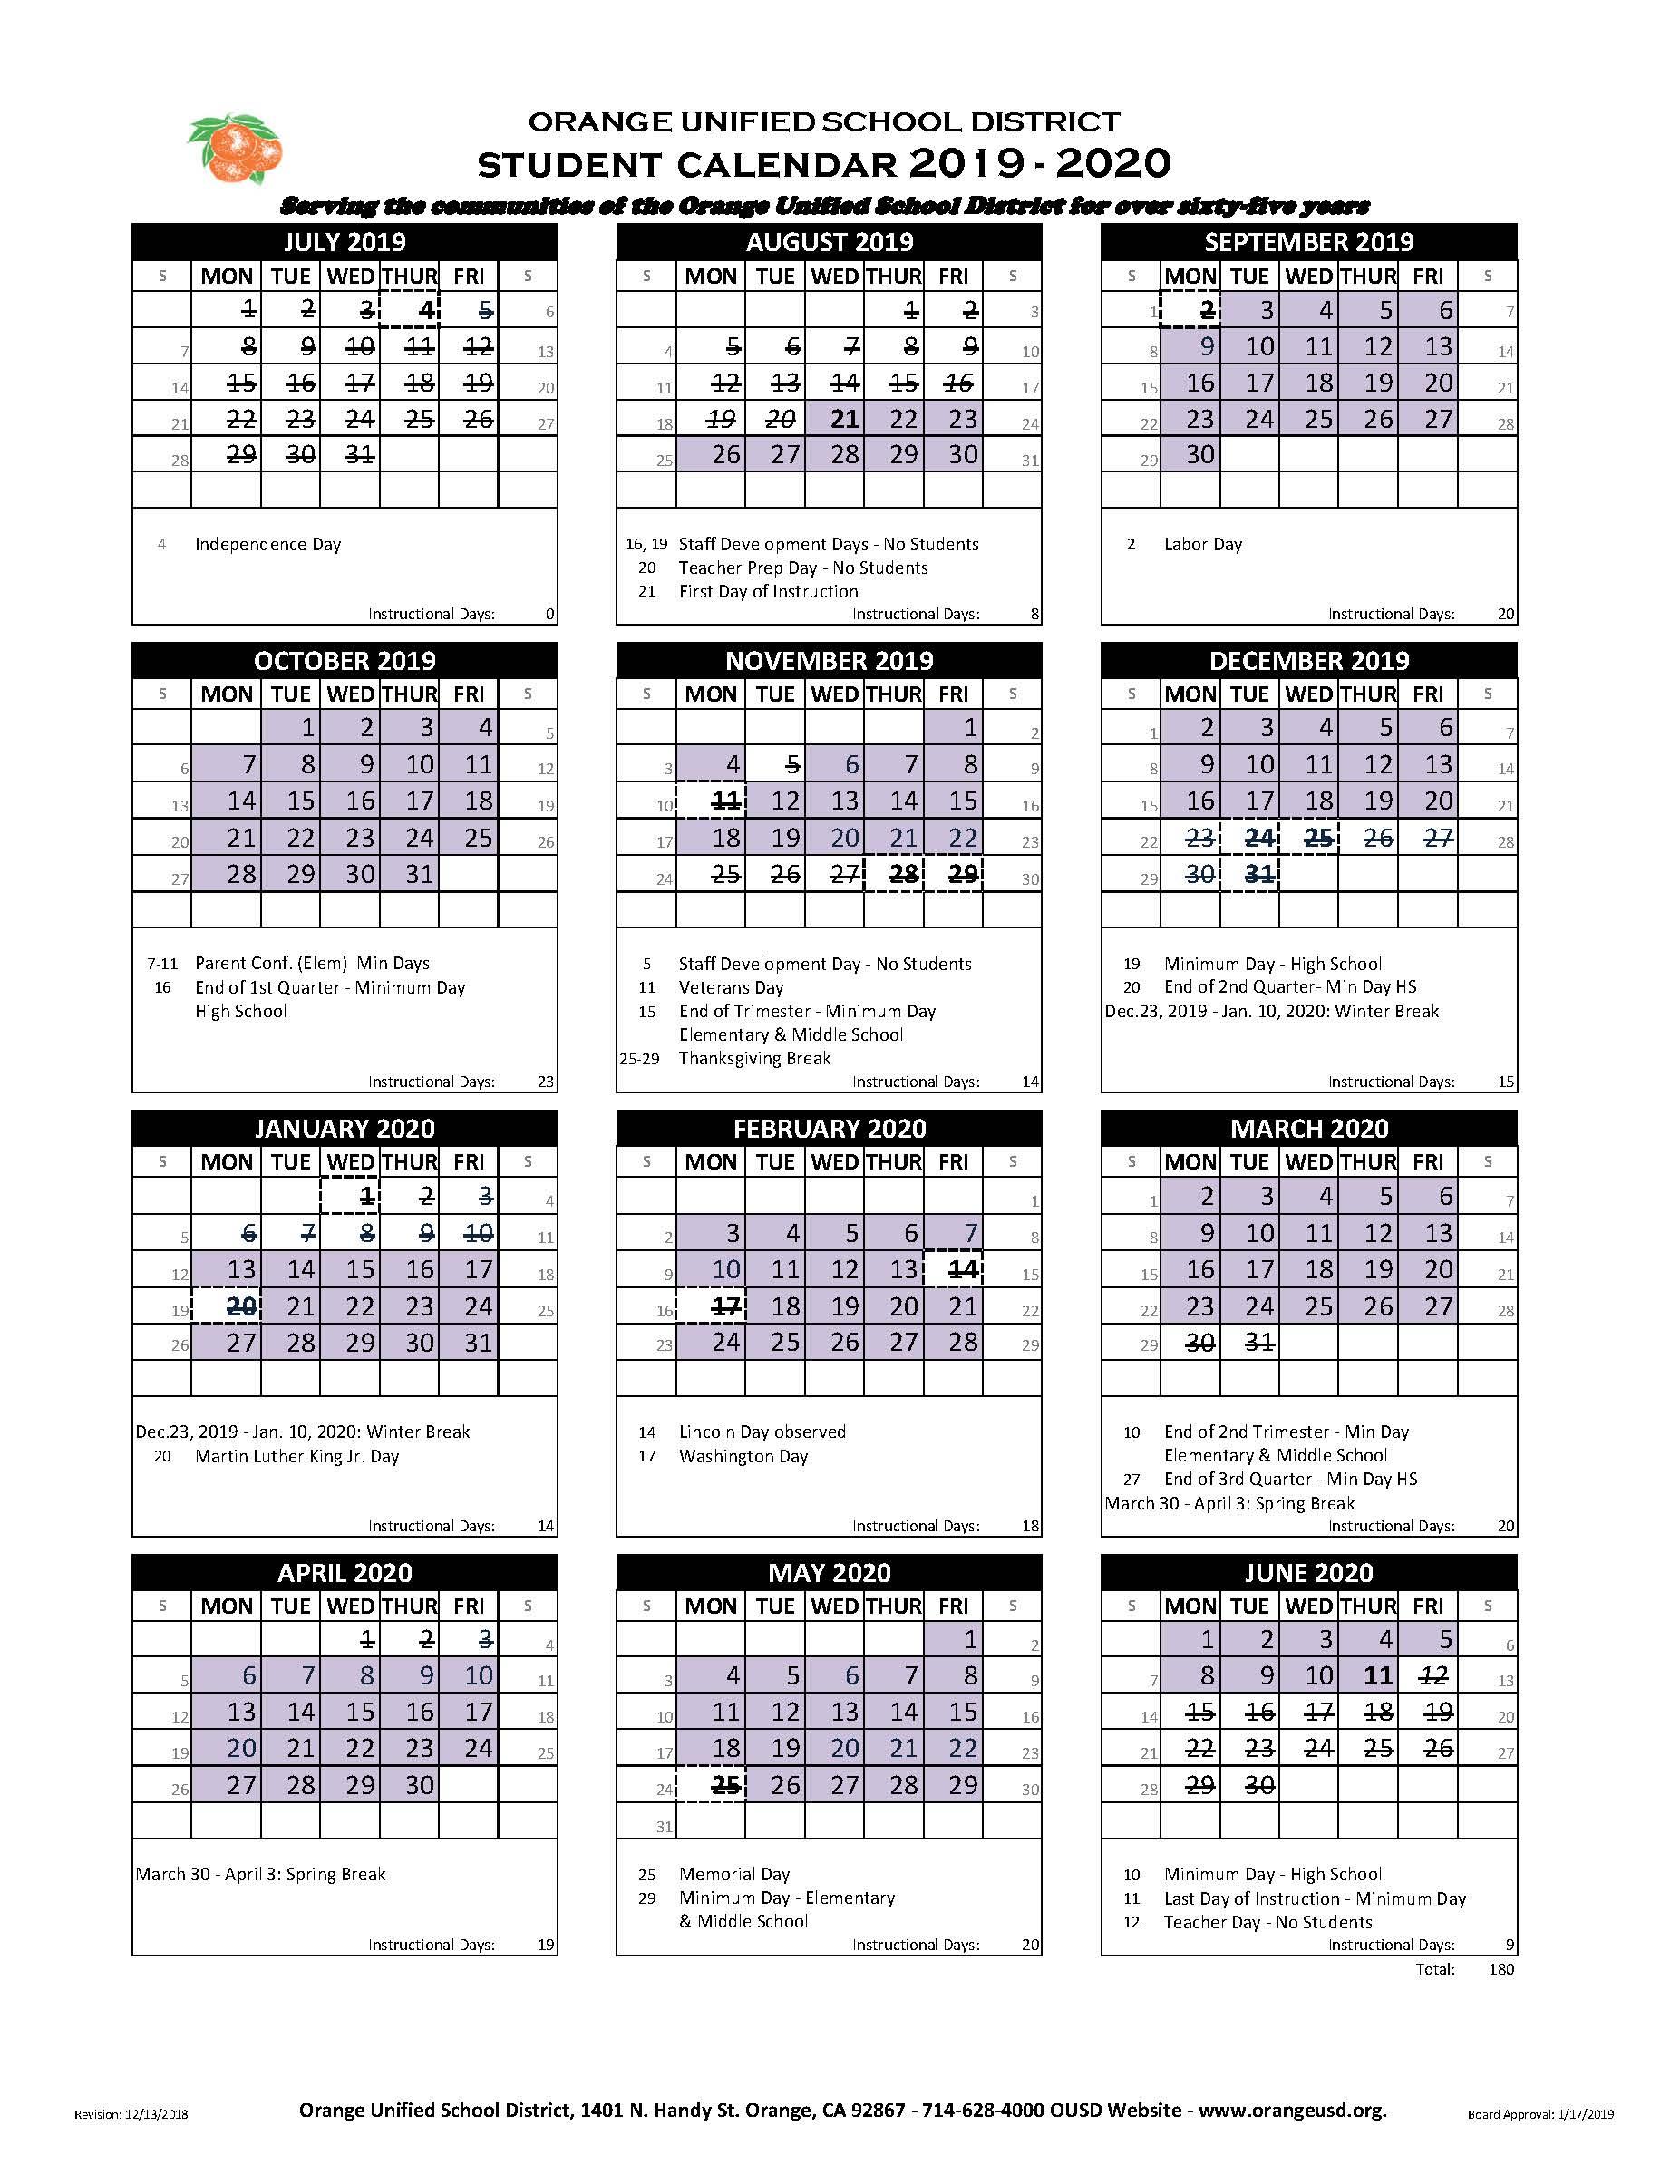 Student Calendar - Villa Park High School for Lincoln Unified School District Calendar 2021